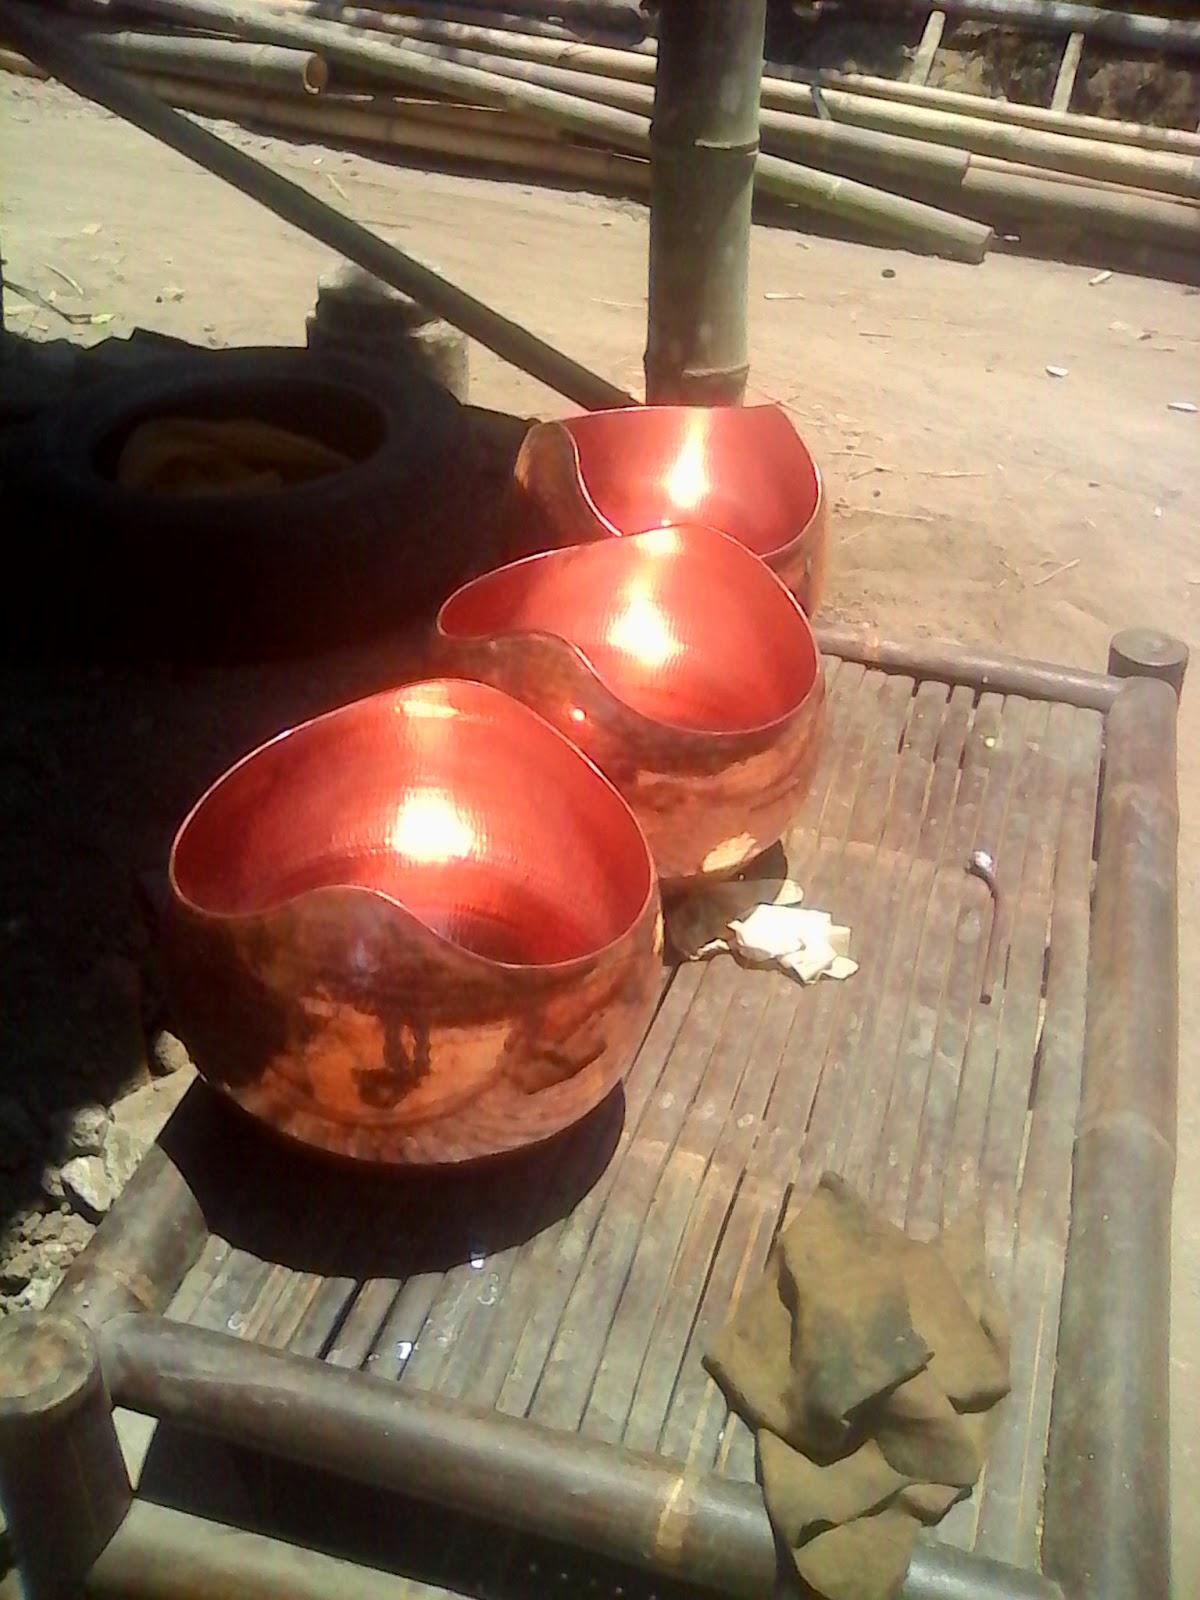 LAMPU GANTUNG TEMBAGA,LAMPU GANTUNG KUNINGAN